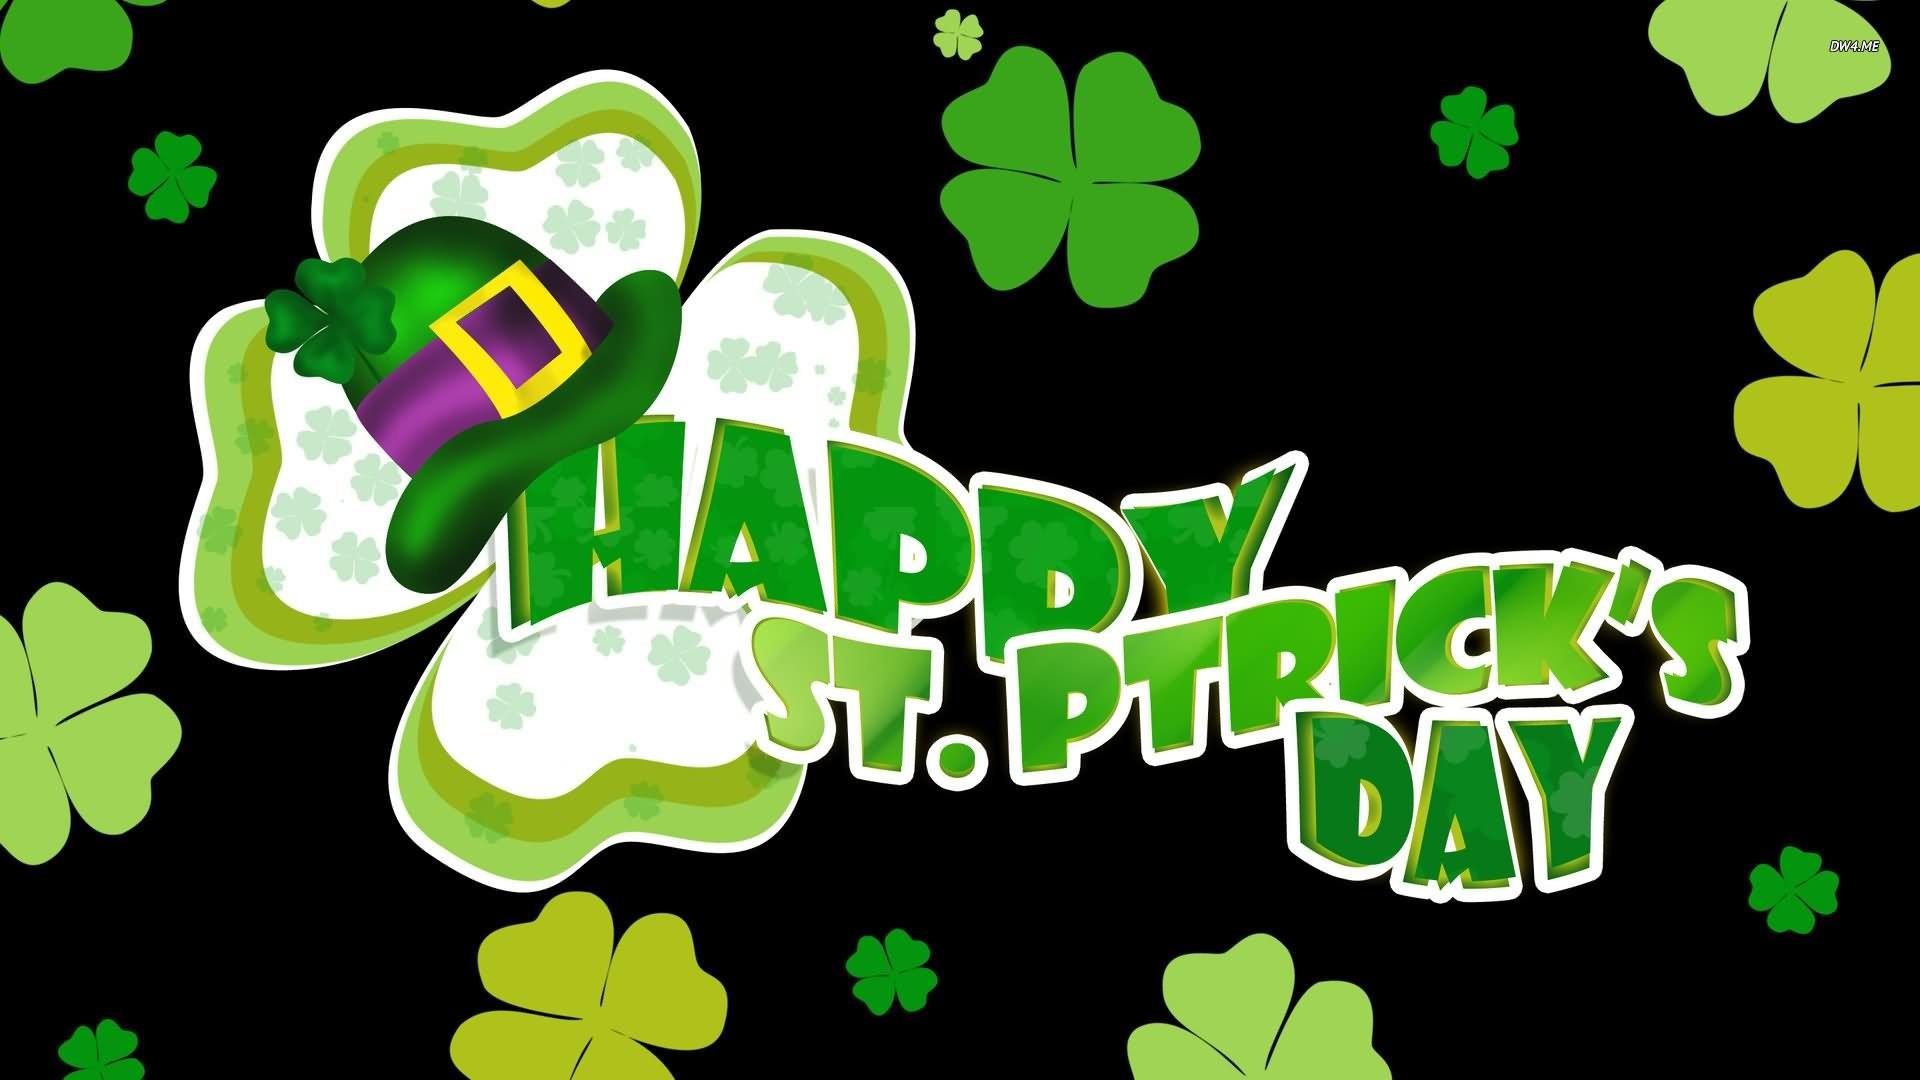 Happy Saint Patrick's Day HD Wallpaper For Desktop